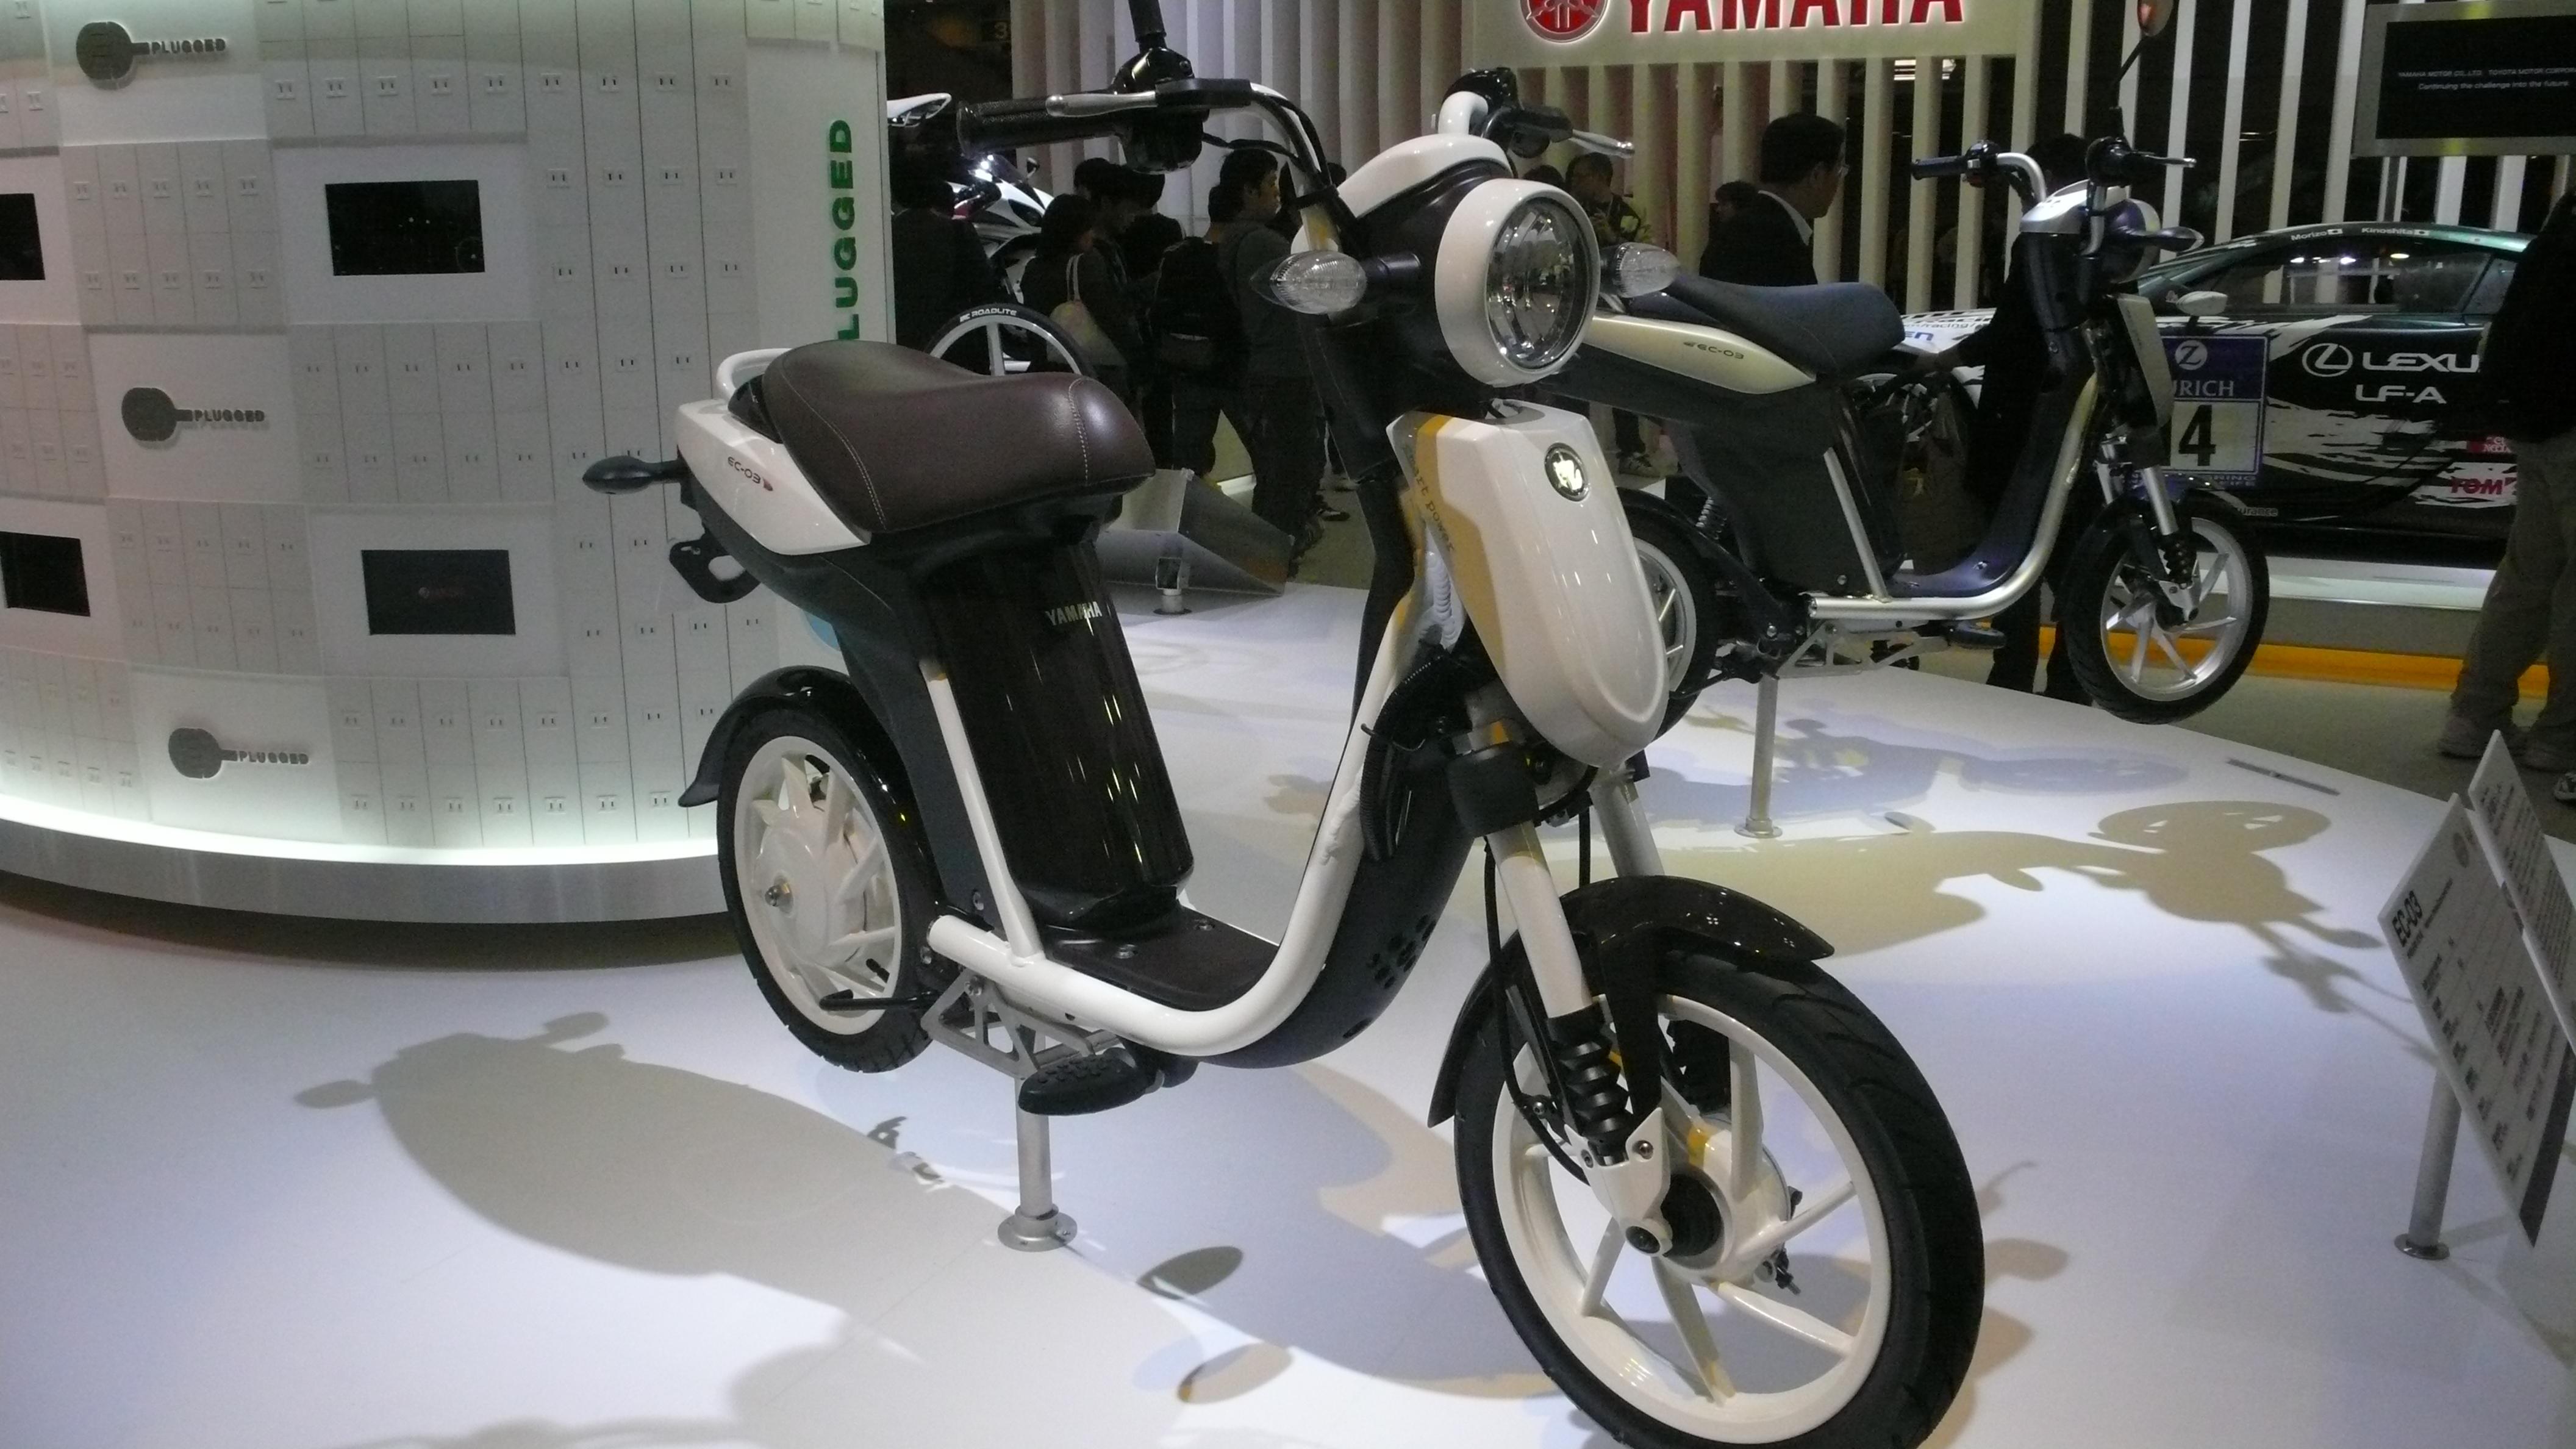 Yamaha Motor's new President speaks of electric future